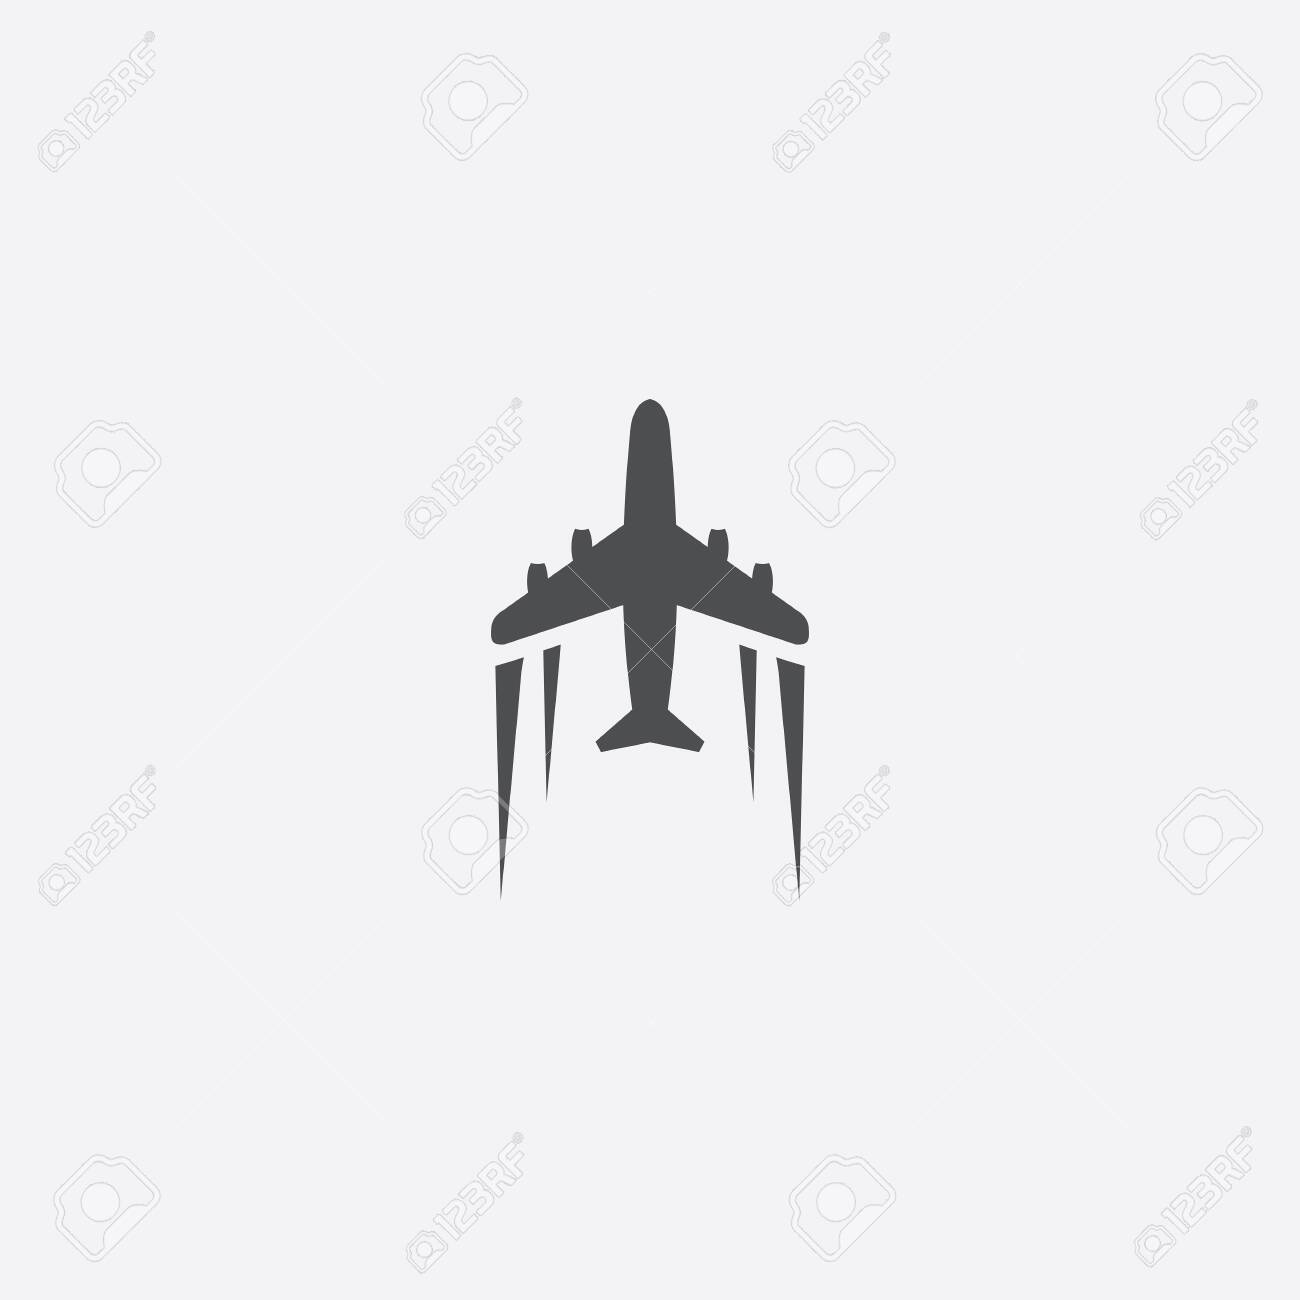 plane icon - 143059826